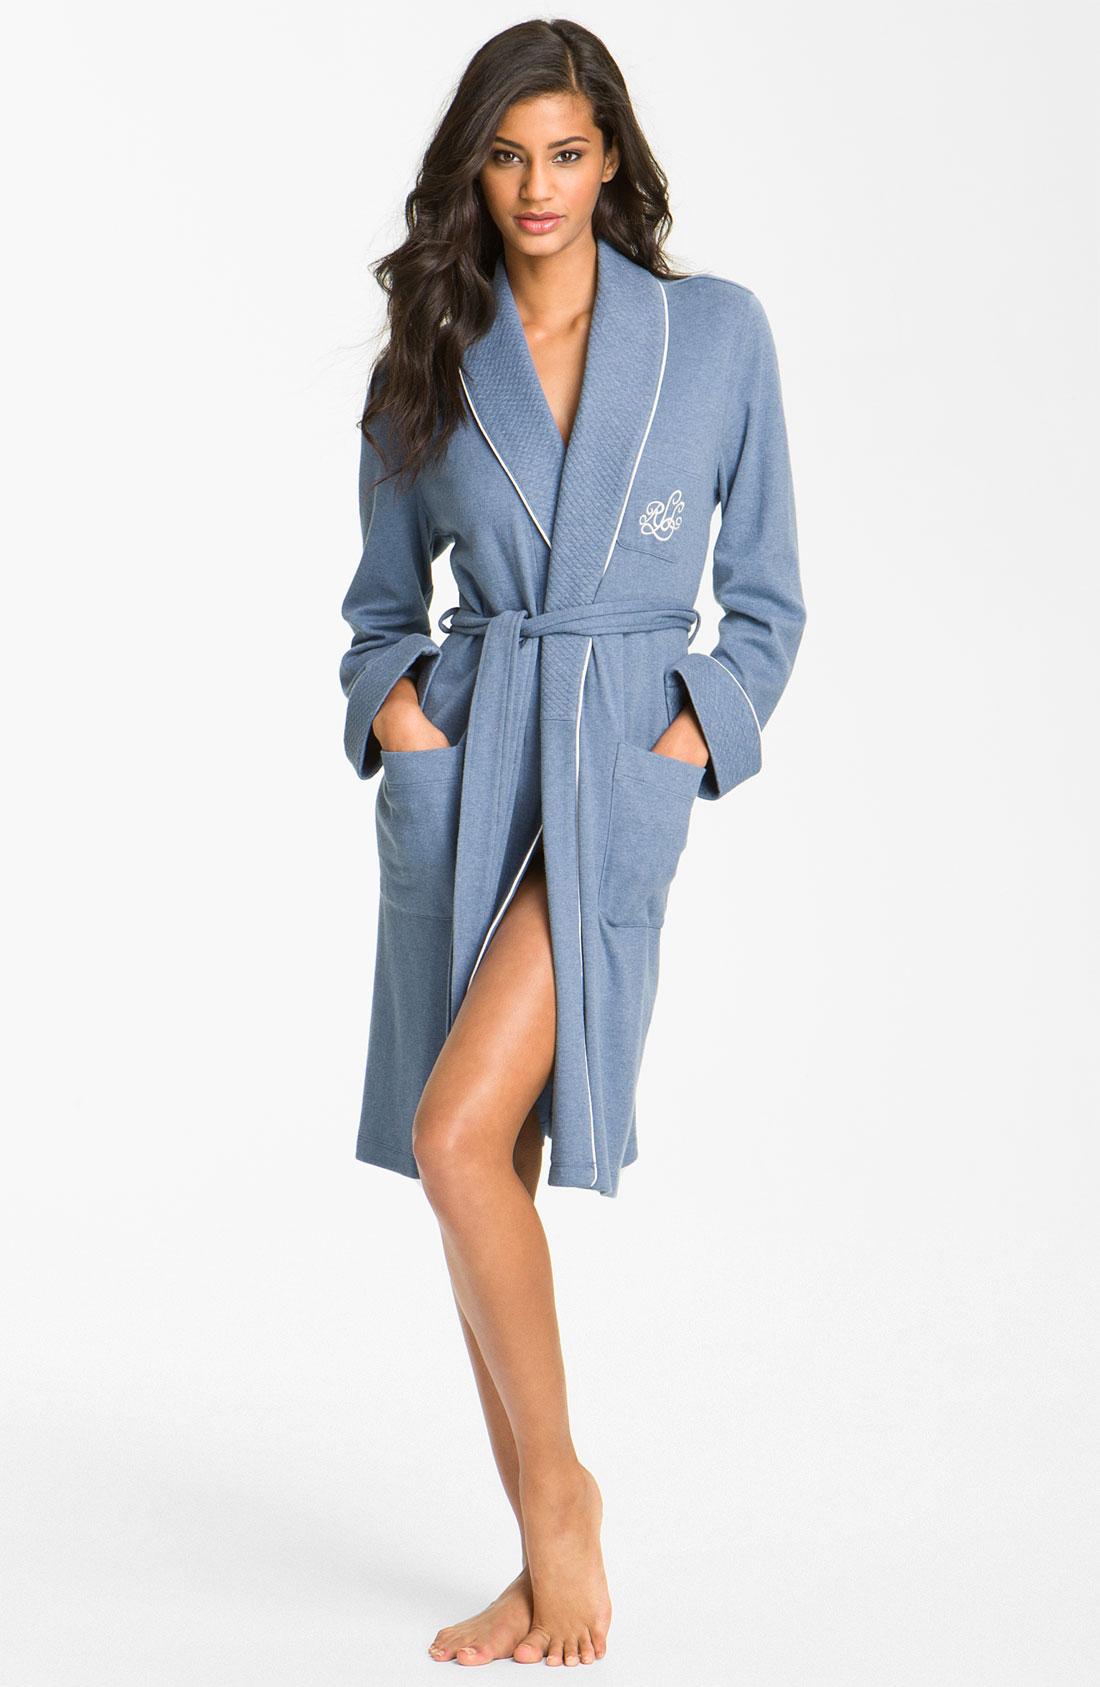 lauren by ralph lauren sleepwear quilted collar robe in blue impression blue heather lyst. Black Bedroom Furniture Sets. Home Design Ideas